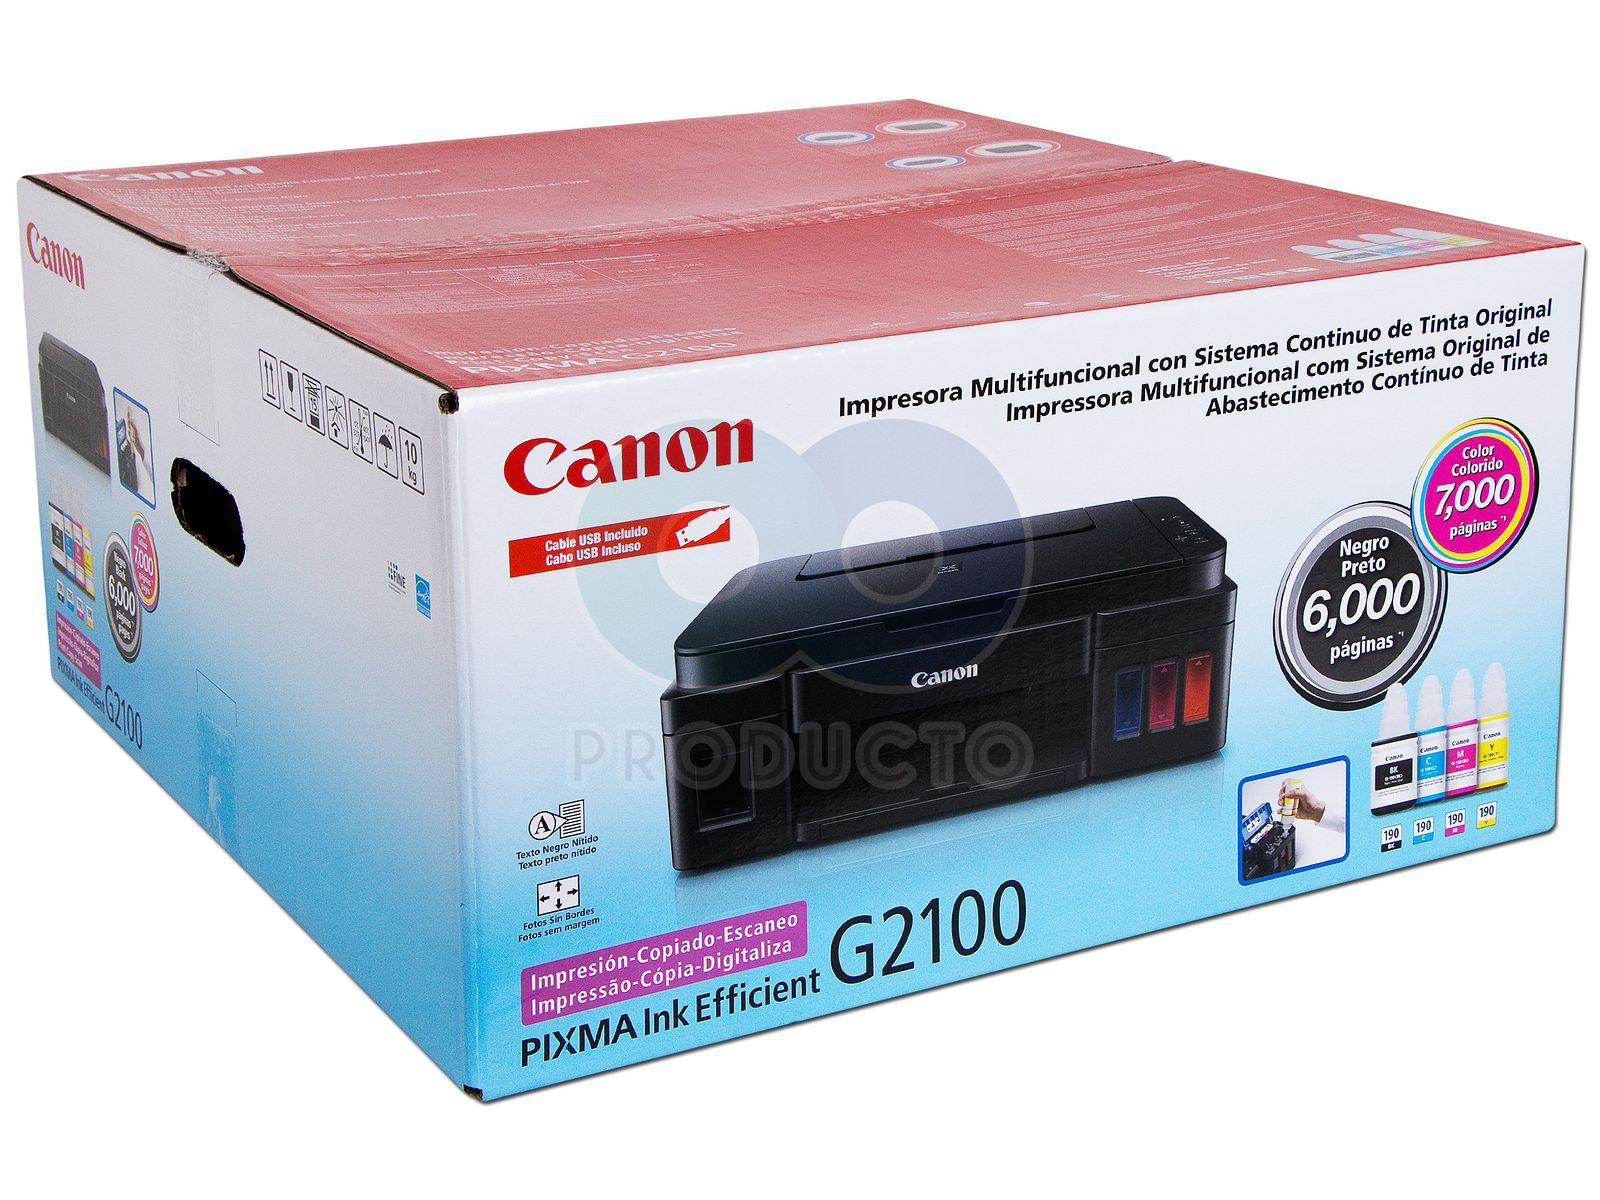 Multifuncional Canon Pixma G2100 Resoluci 243 N Hasta 4800 X